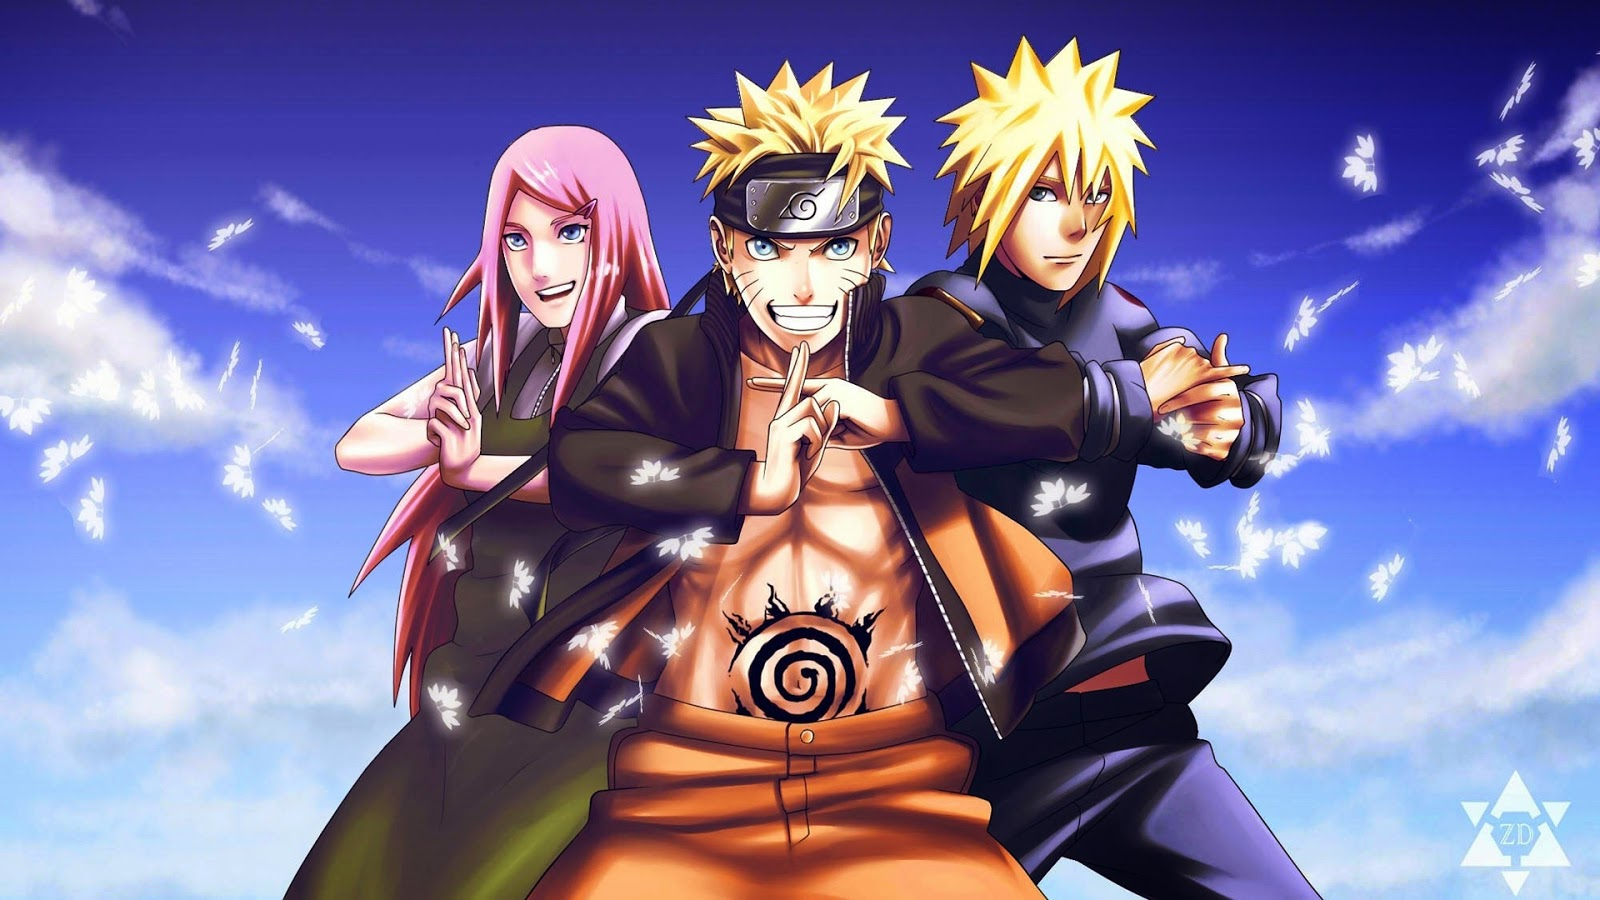 Naruto And Friends Wallpaper